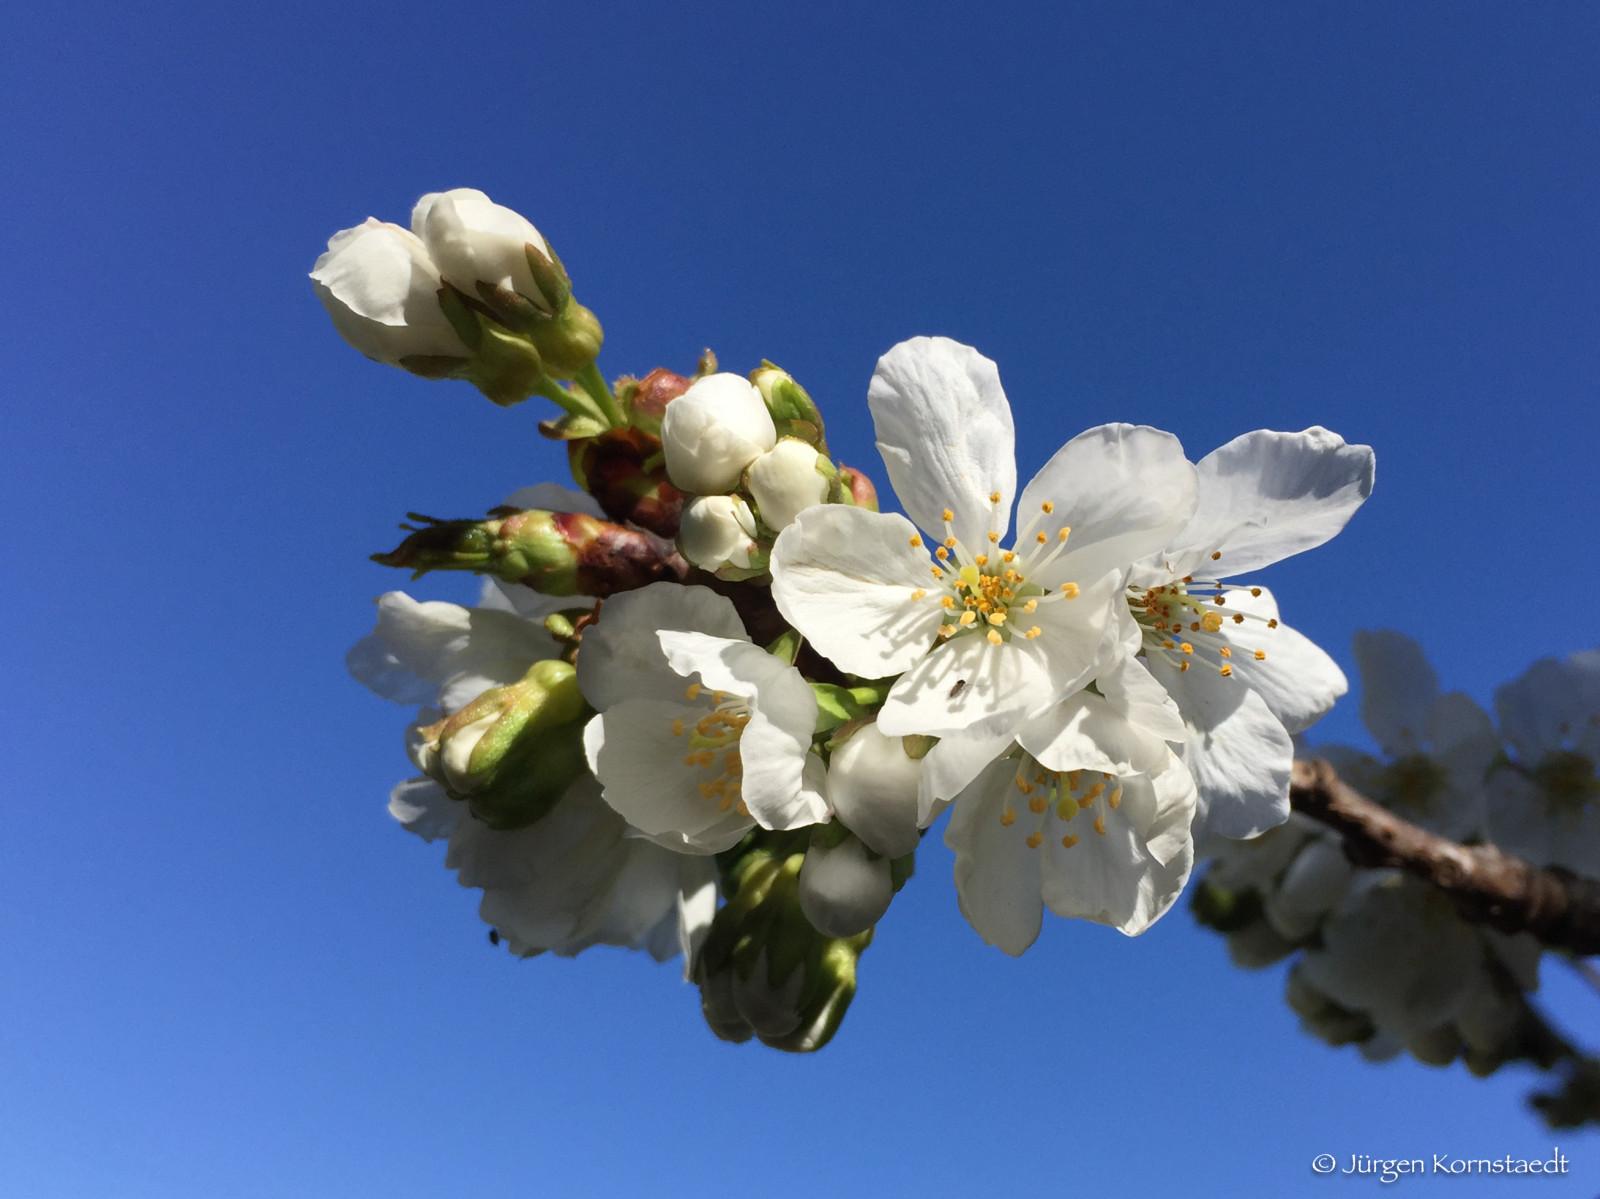 Fond D Ecran Ciel Blanc Branche Printemps Brindille Fleur De